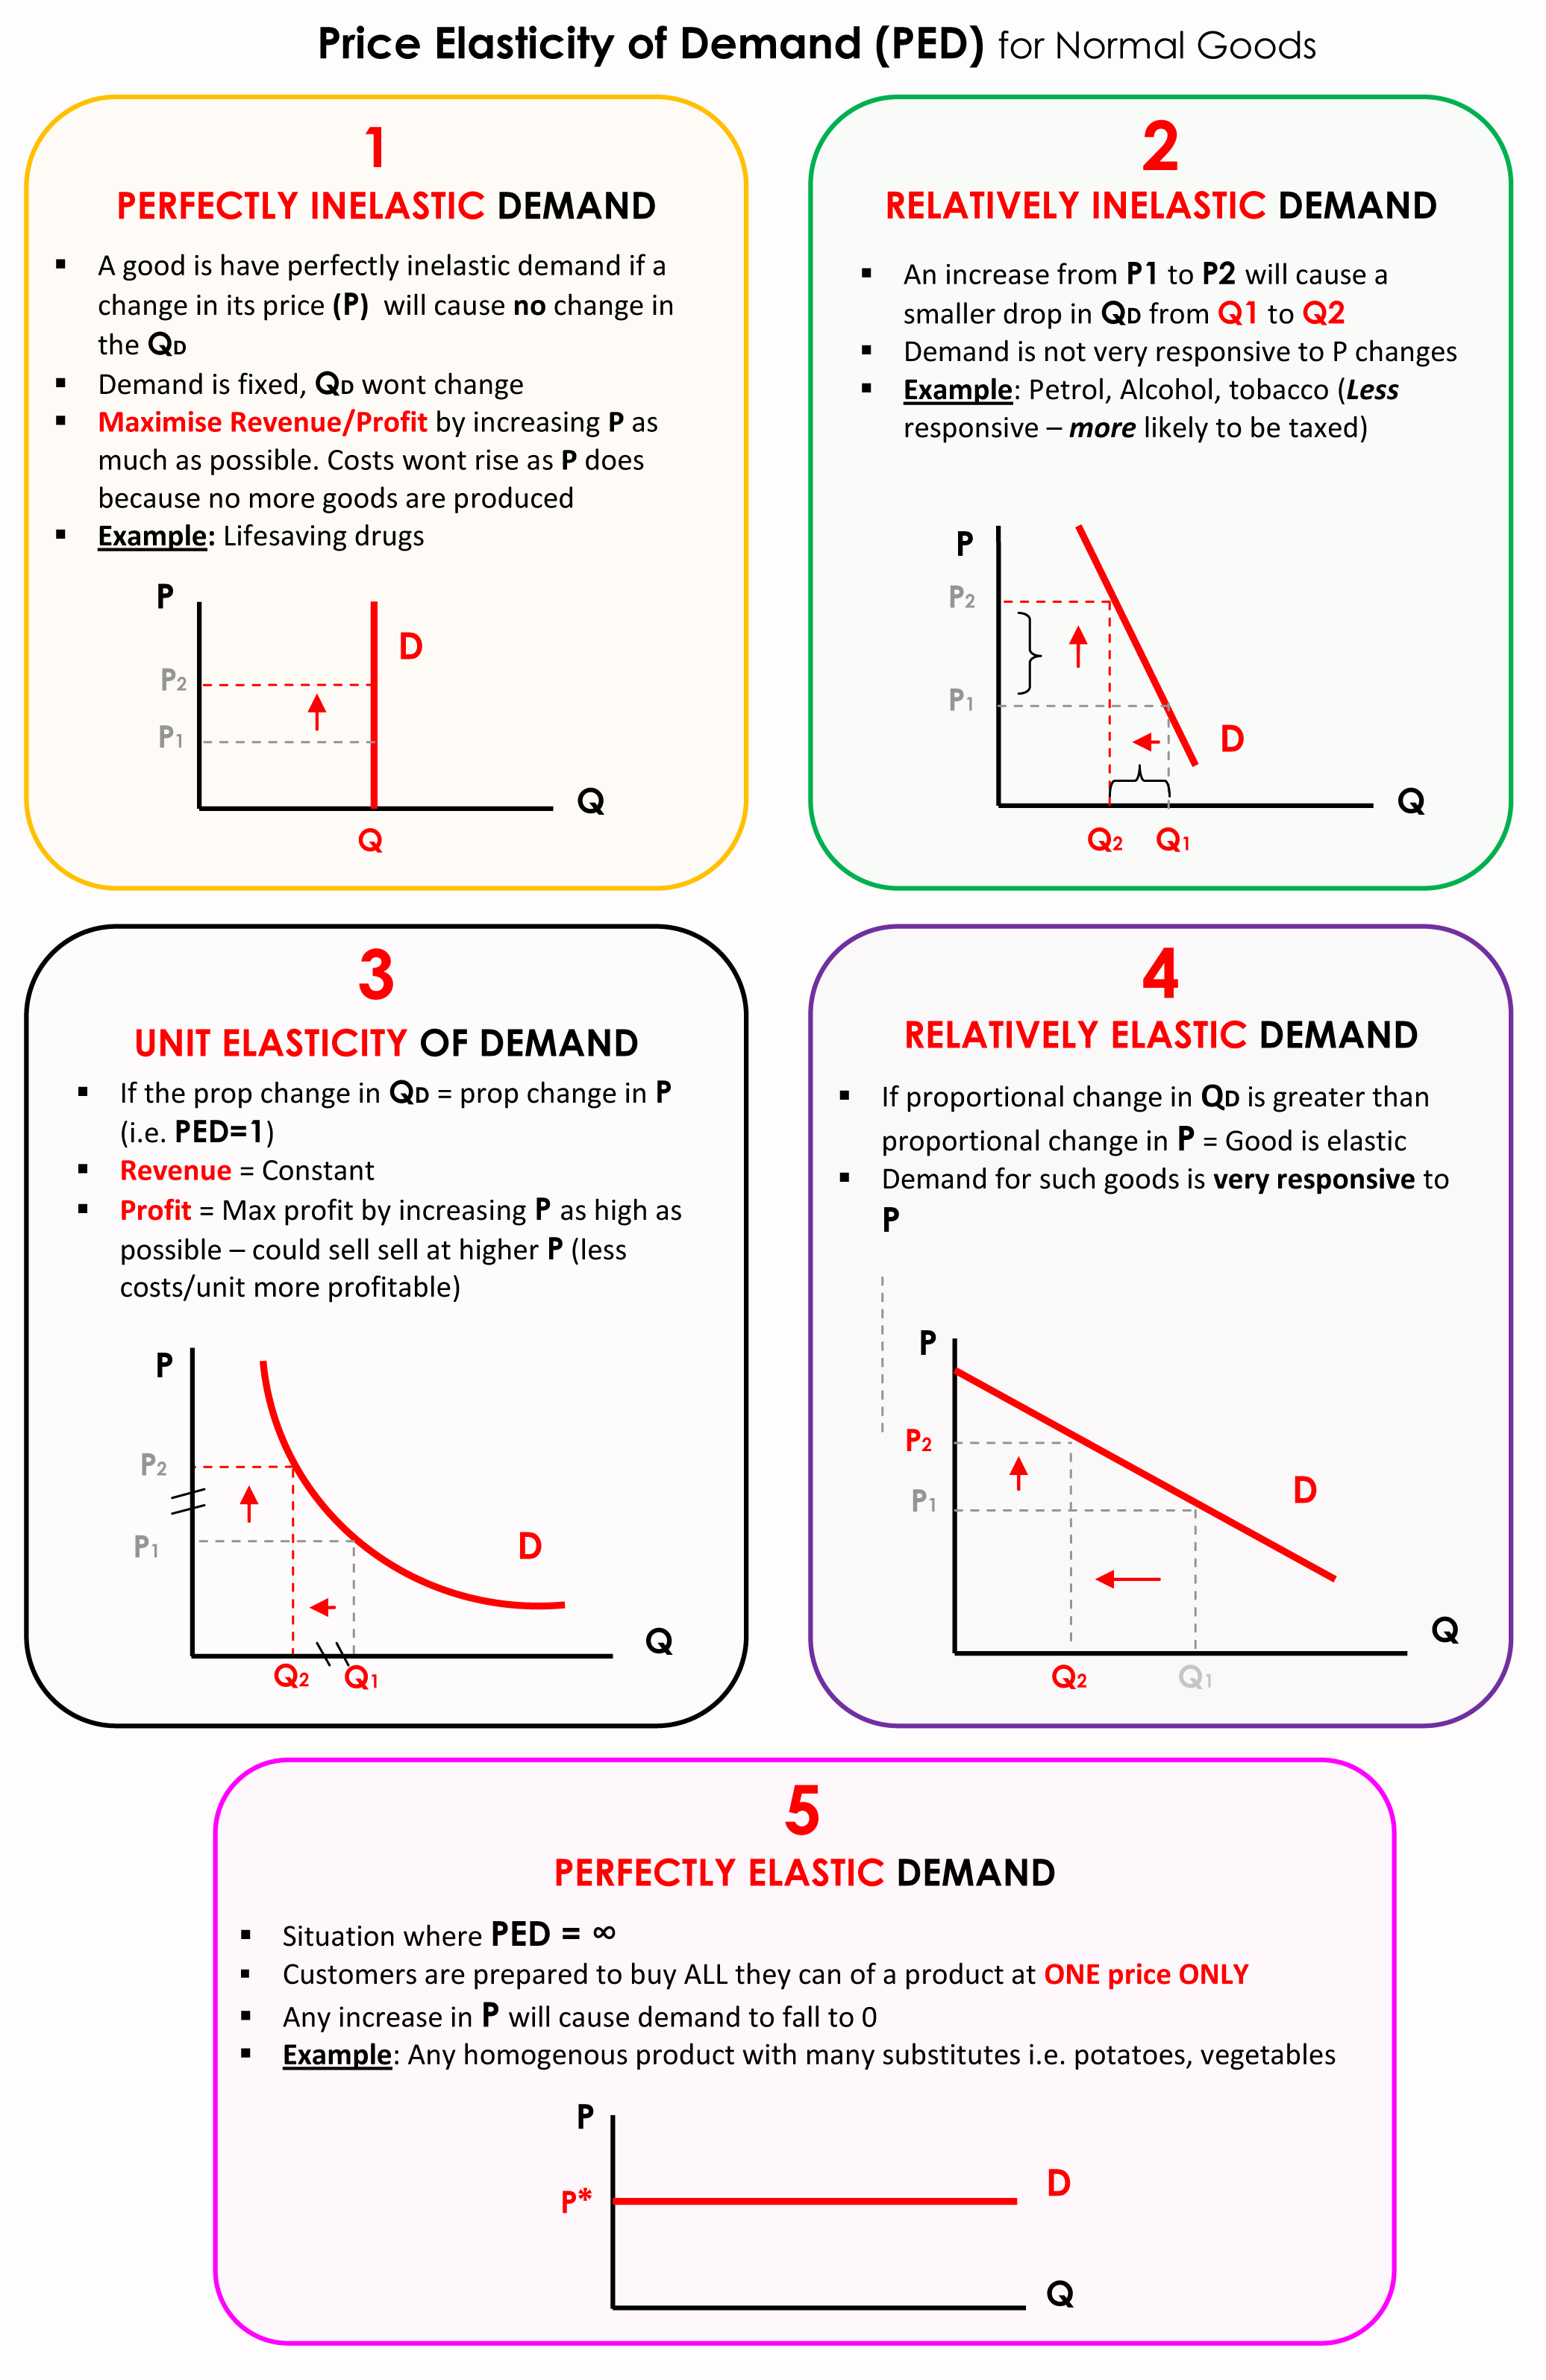 Microeconomics Elasticity Of Demand And Elasticity Of Demand